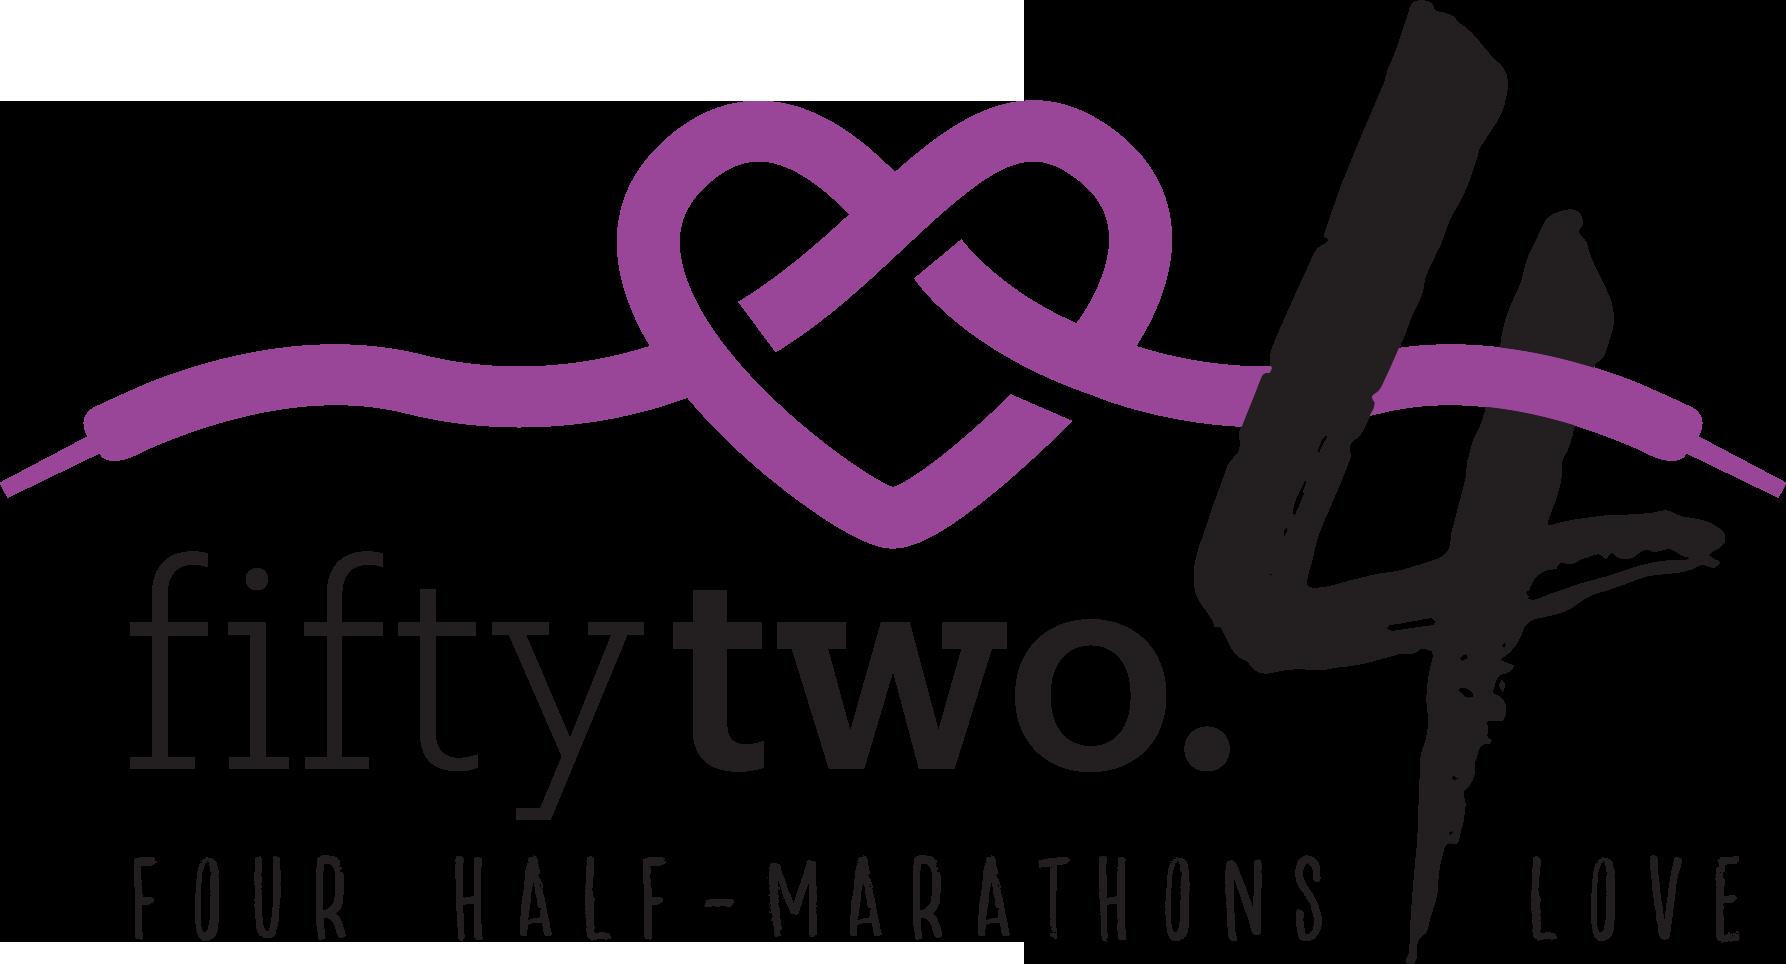 52.4 miles of love